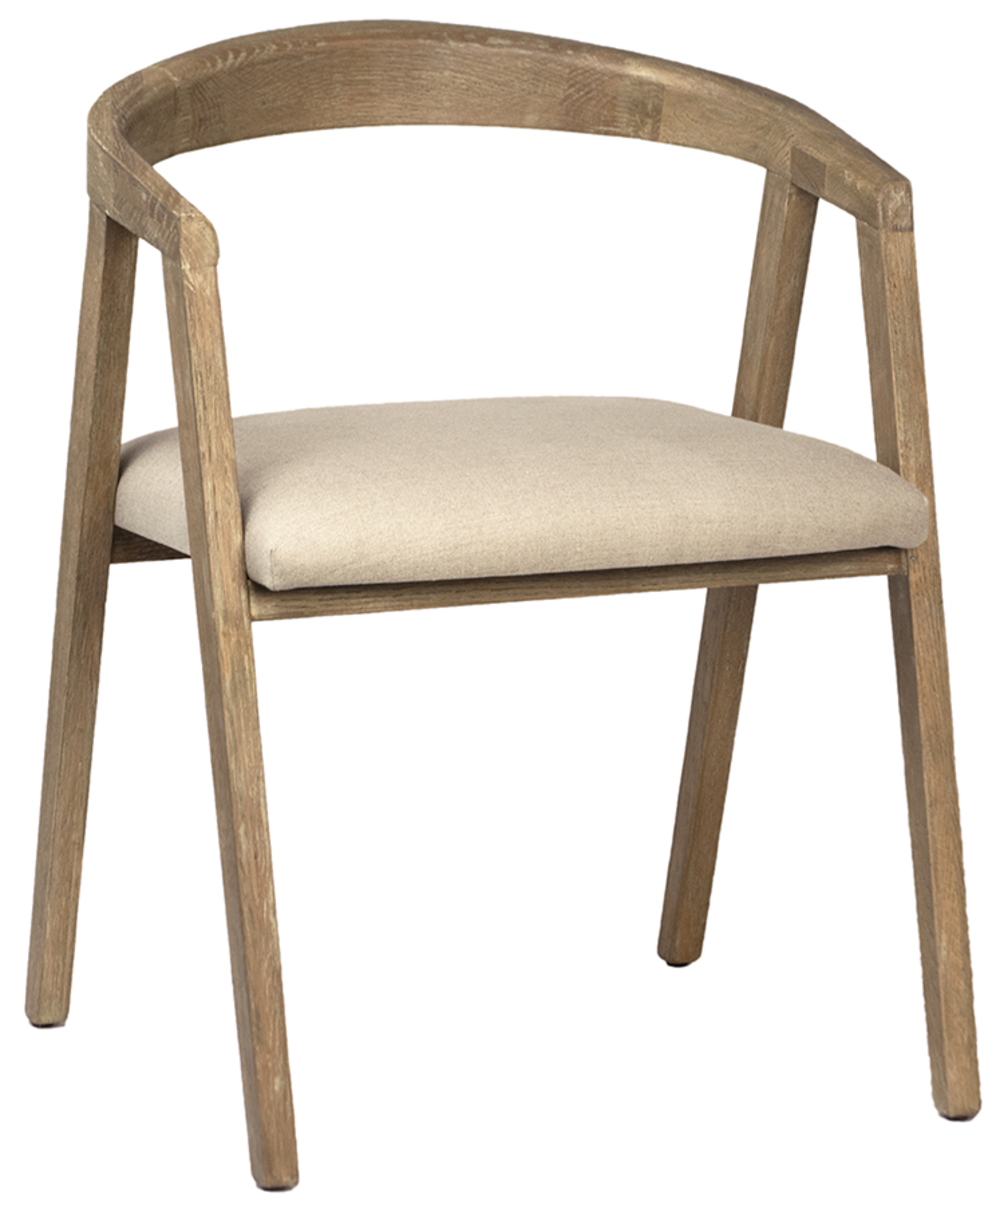 Dovetail Furniture - Jensen Dining Chair